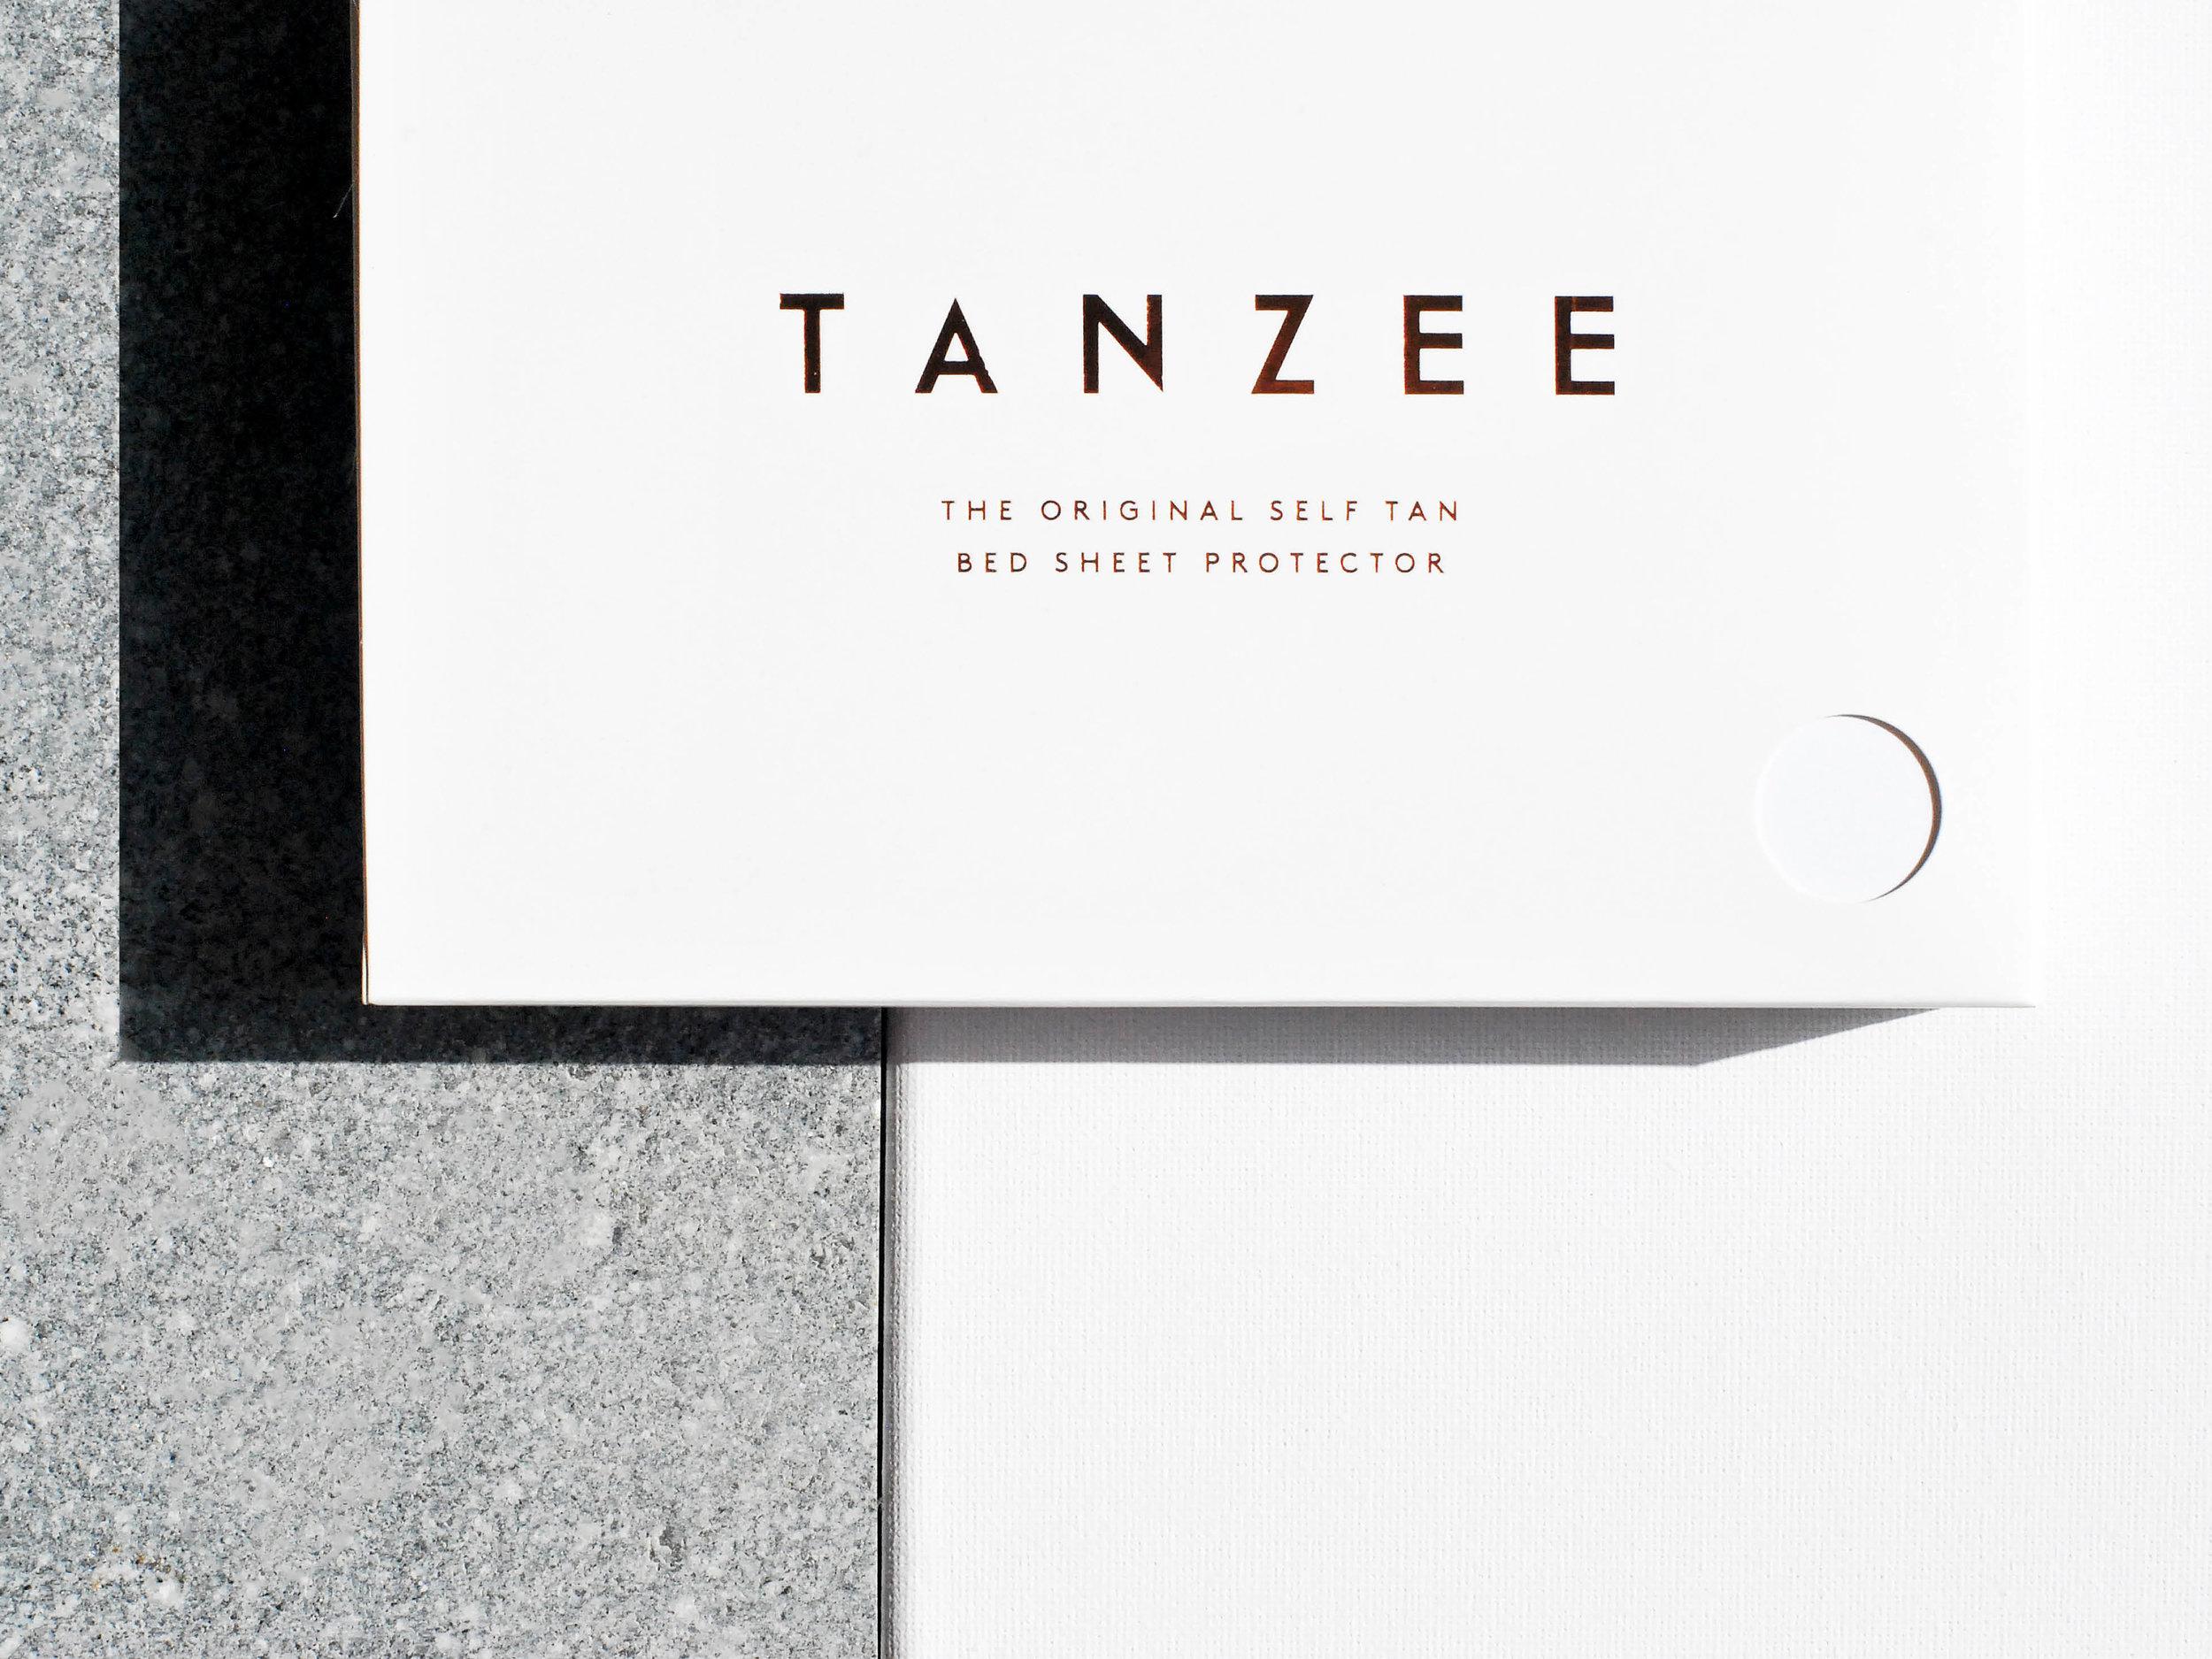 Tanzee_Body_Packaging_Branding_Design_3